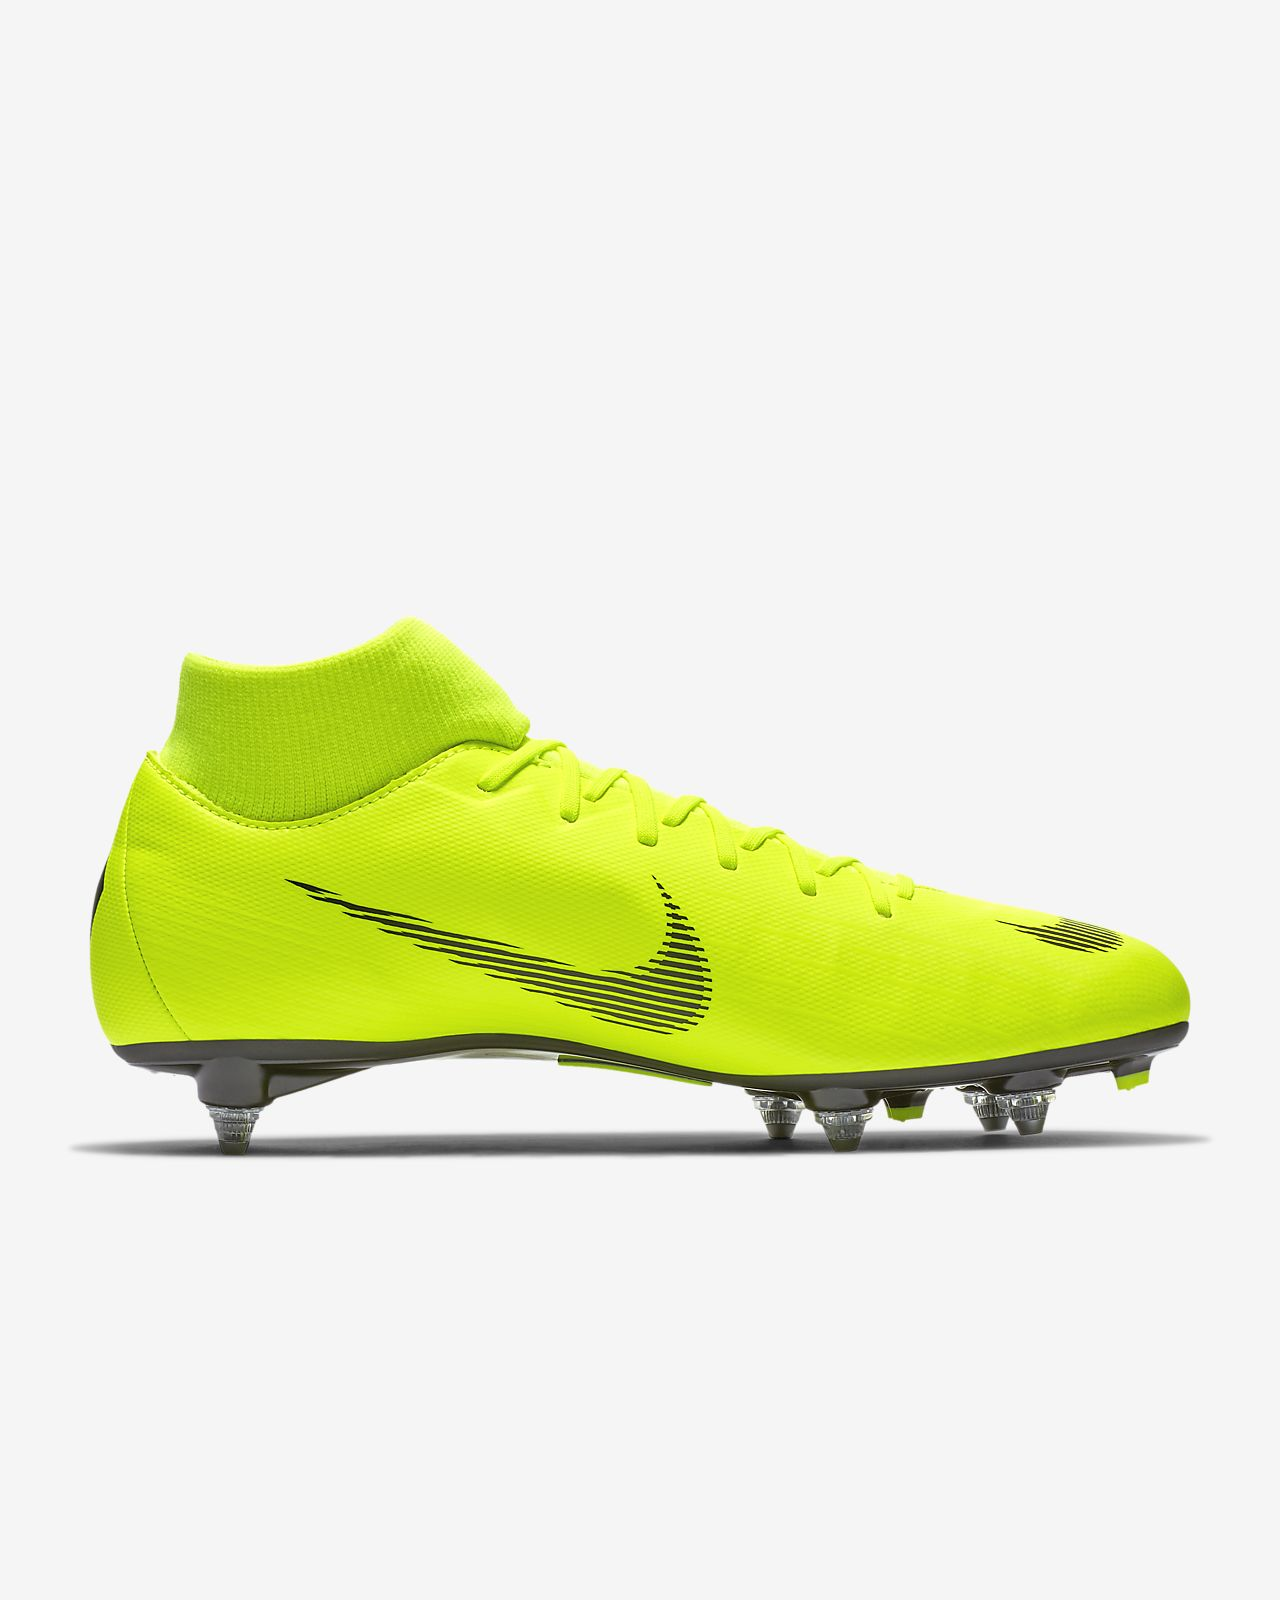 brand new 752f1 7e6c1 ... Chaussure de football à crampons pour terrain gras Nike Mercurial  Superfly VI Academy SG-PRO